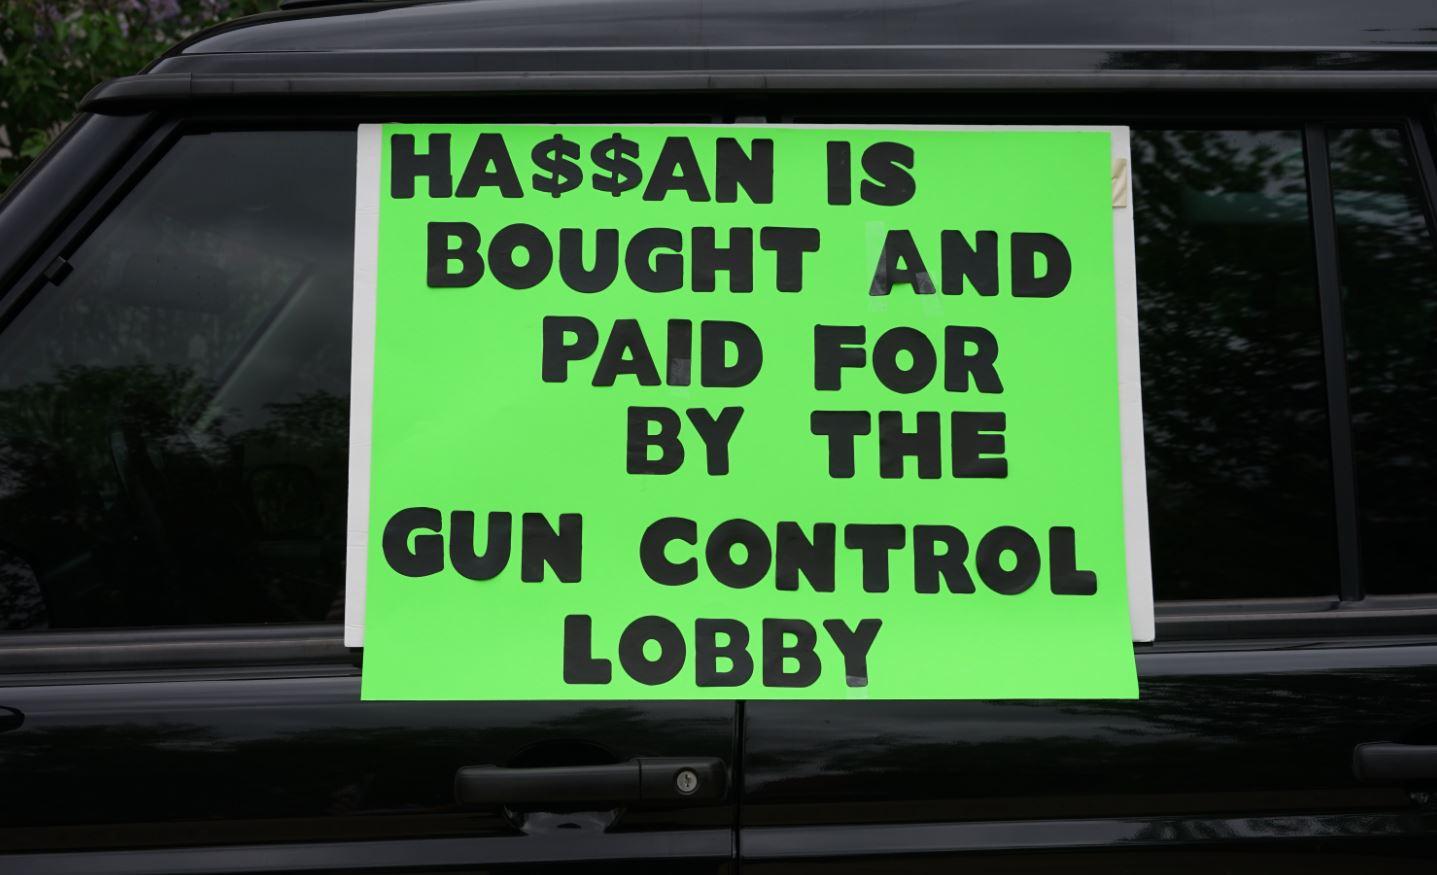 Hassan Gun Control Lobby